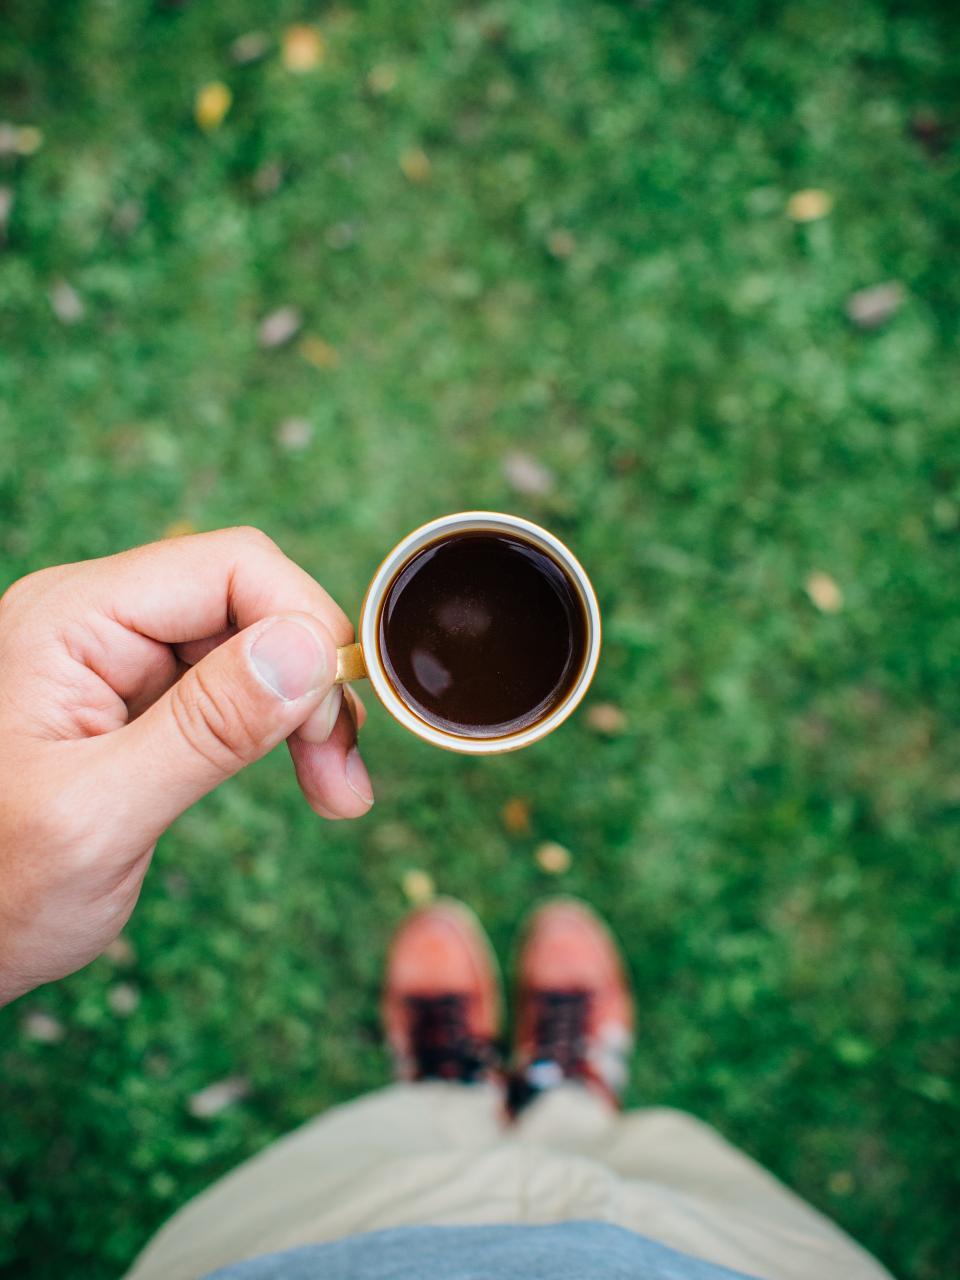 espresso, coffee, hands, grass, outside